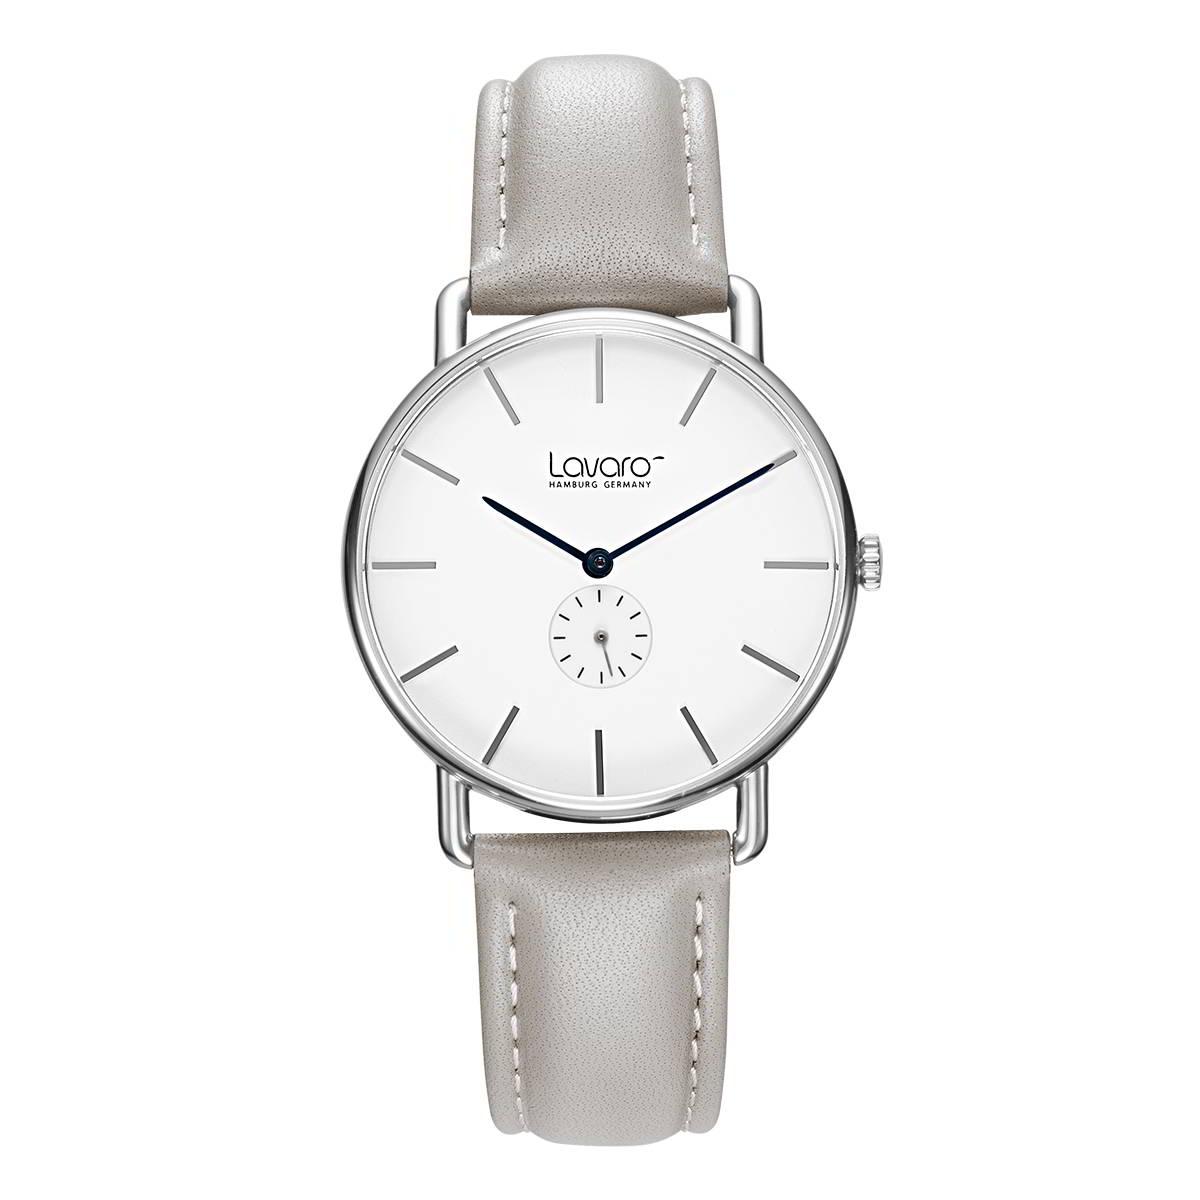 AIR Damen Armbanduhr 36 mm, LA2002 Stahl poliert